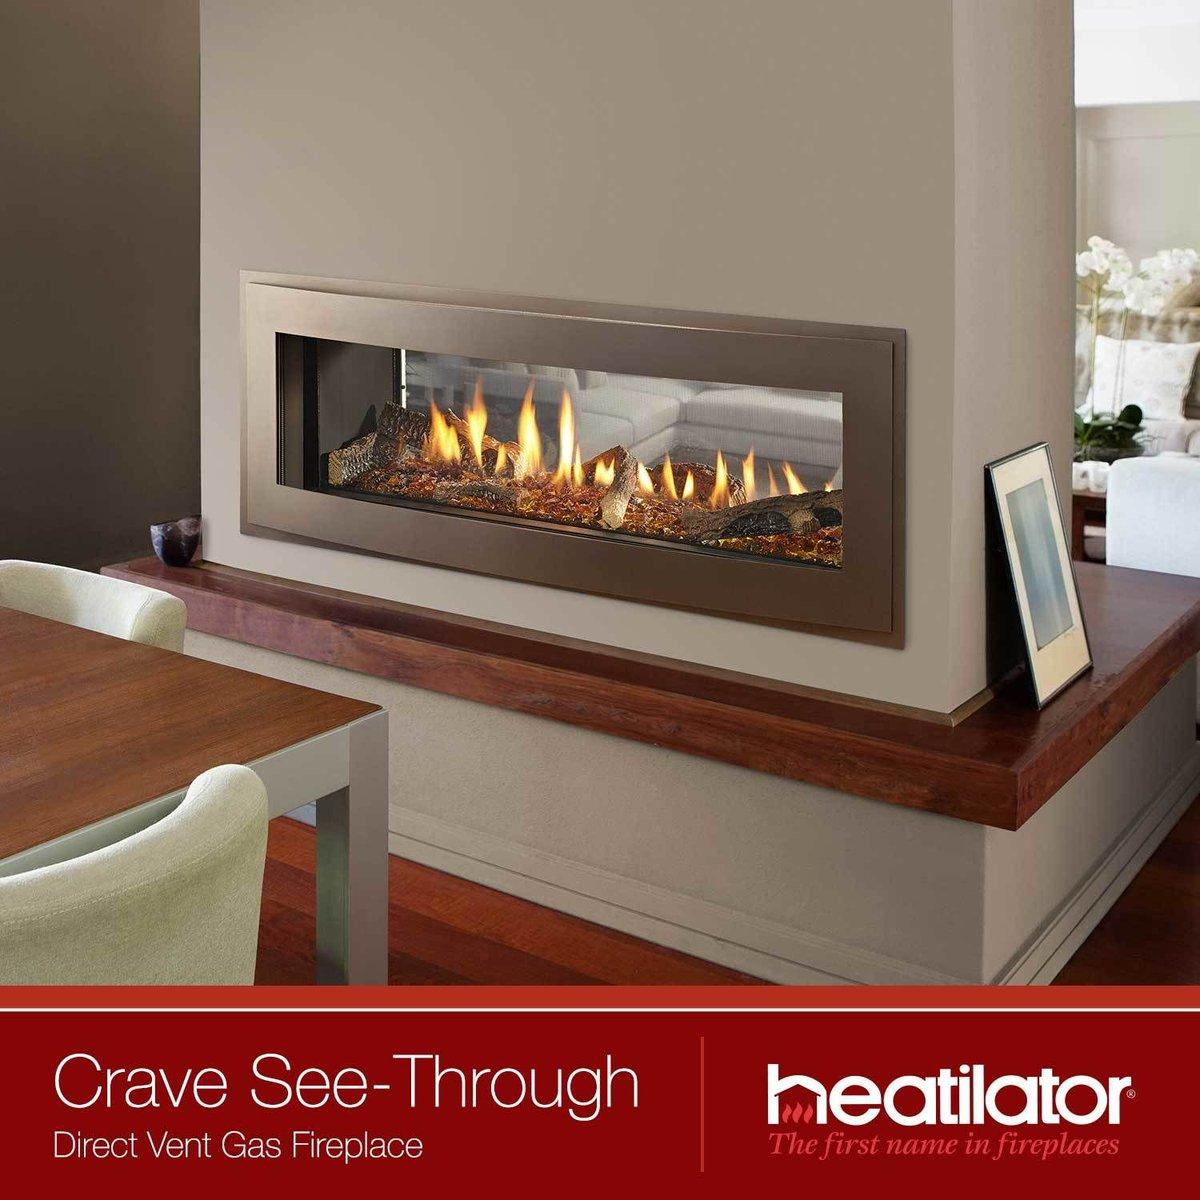 Admirable Heatilator Fireplace Heatilator Twitter Home Interior And Landscaping Mentranervesignezvosmurscom